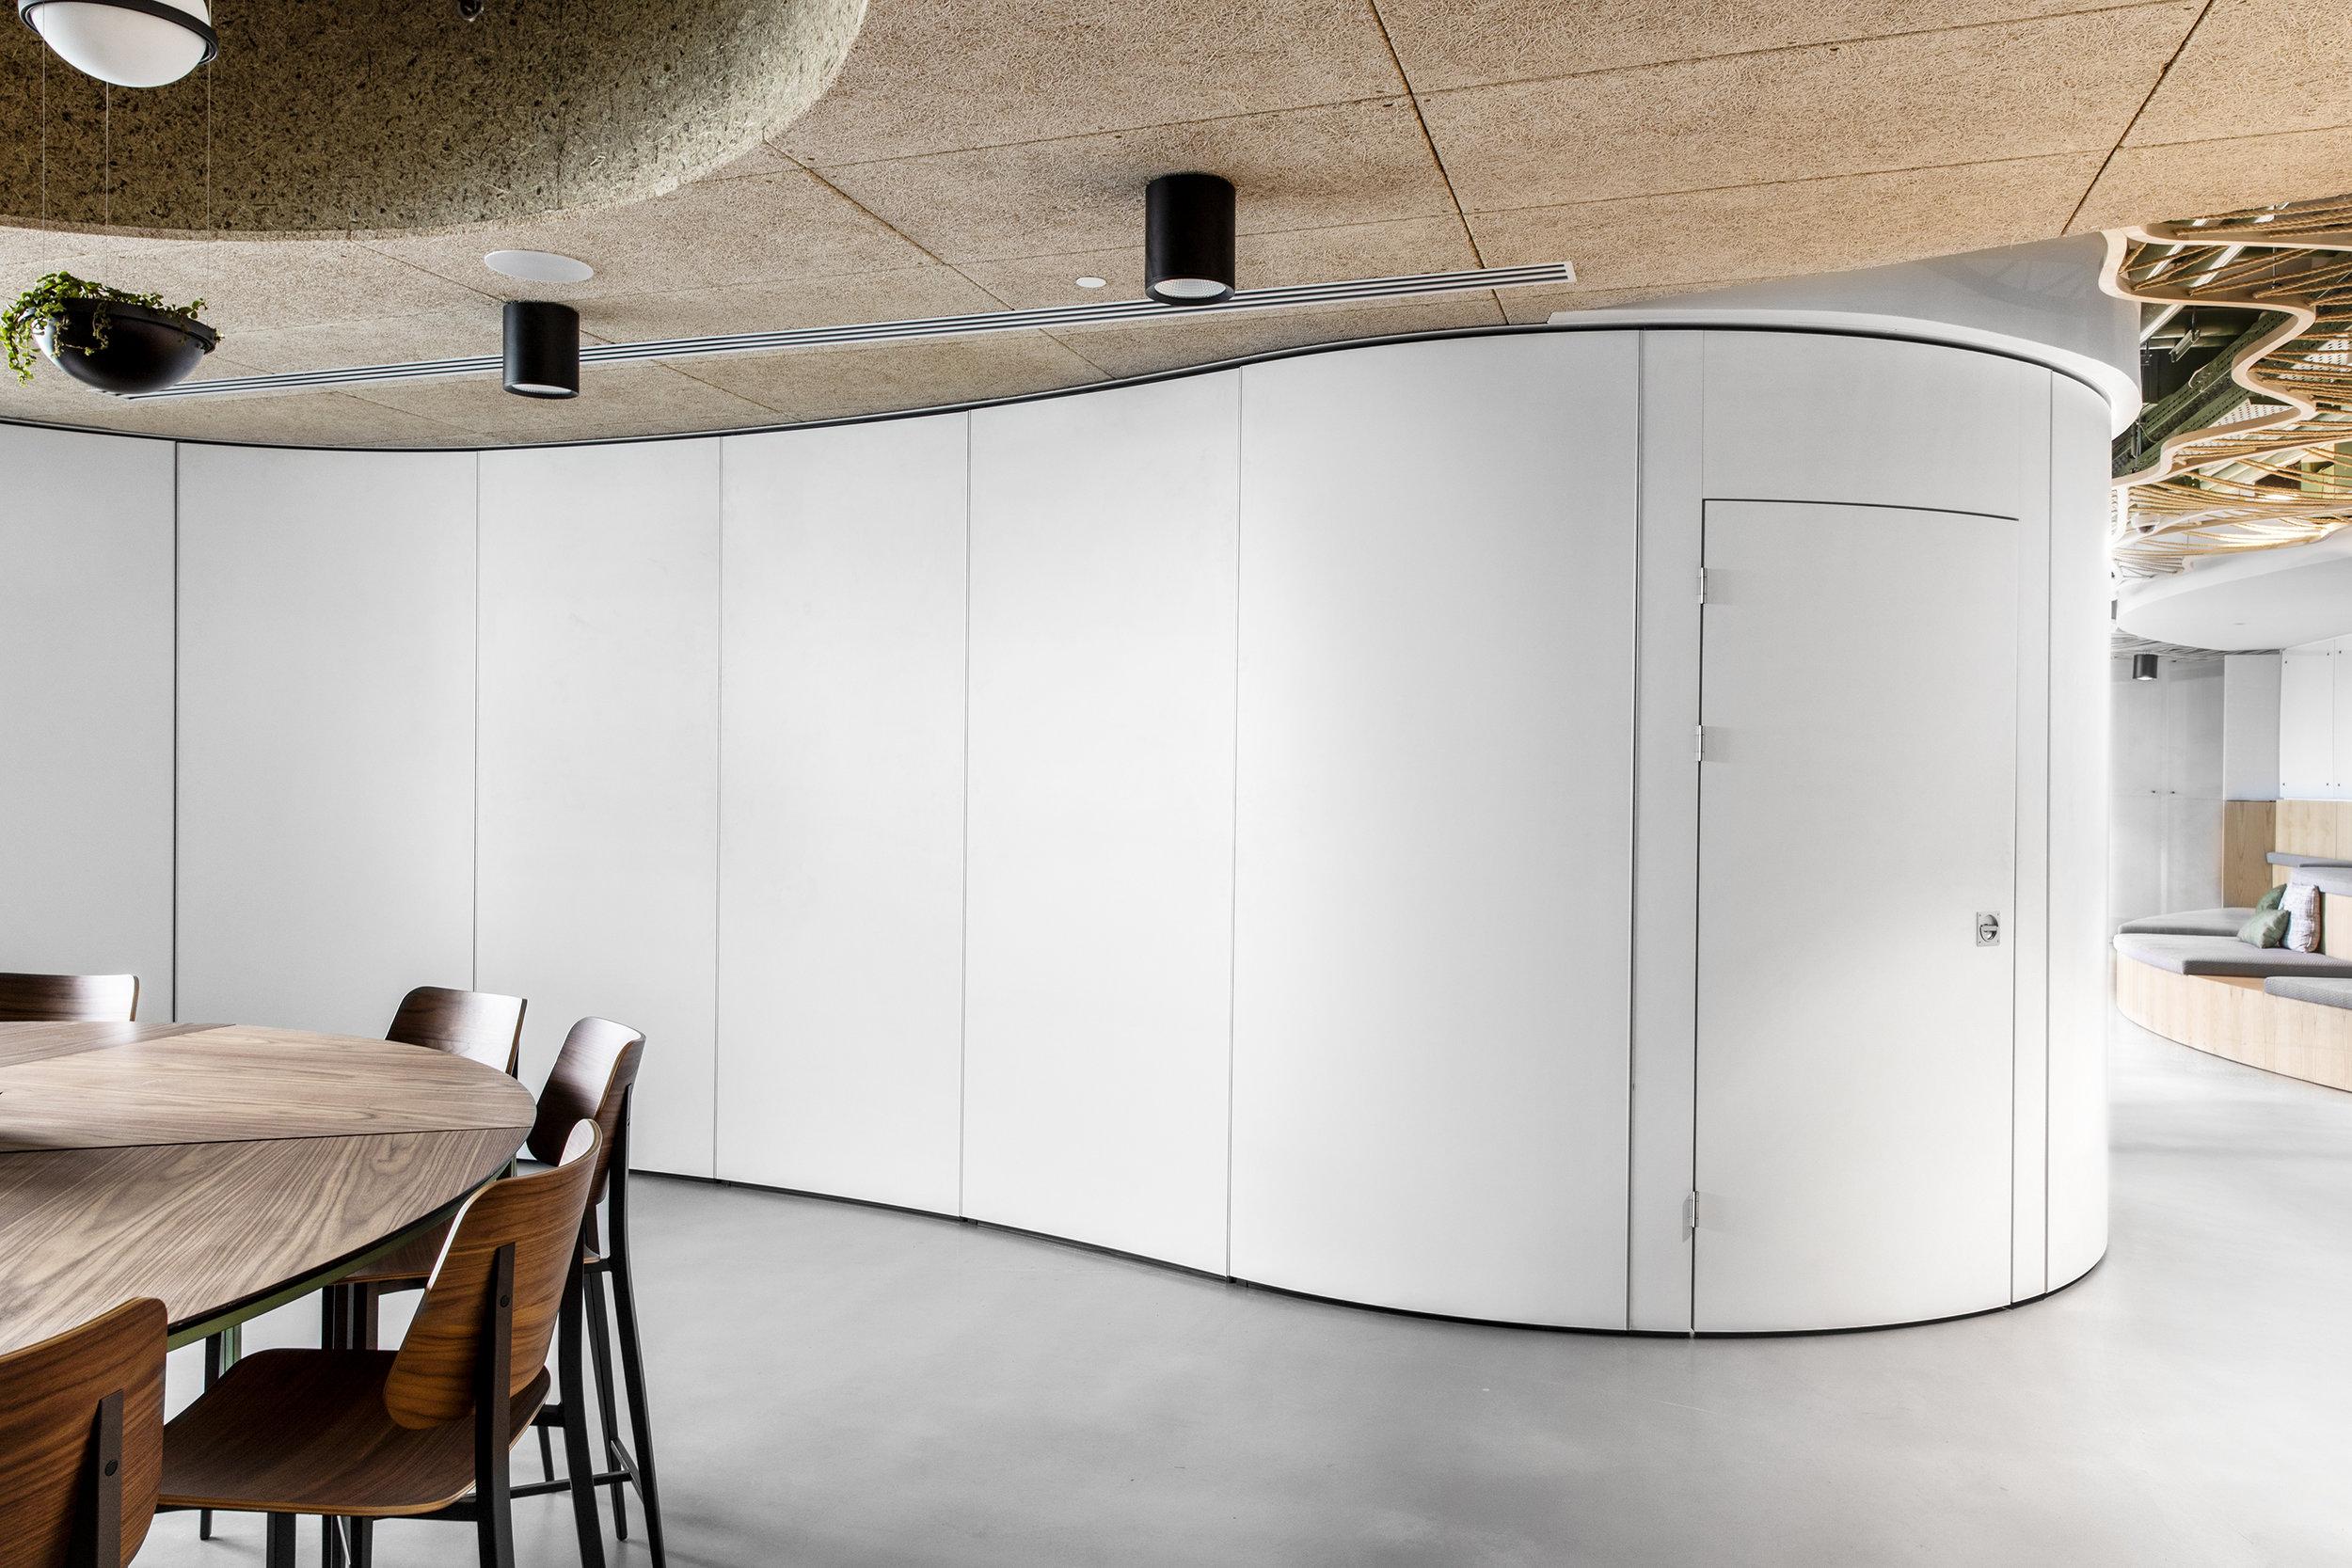 HINNOMAN - ROY DAVID ARCHTECTURE - STUDIO - סטודיו רואי דוד - אדריכלים (41).jpg